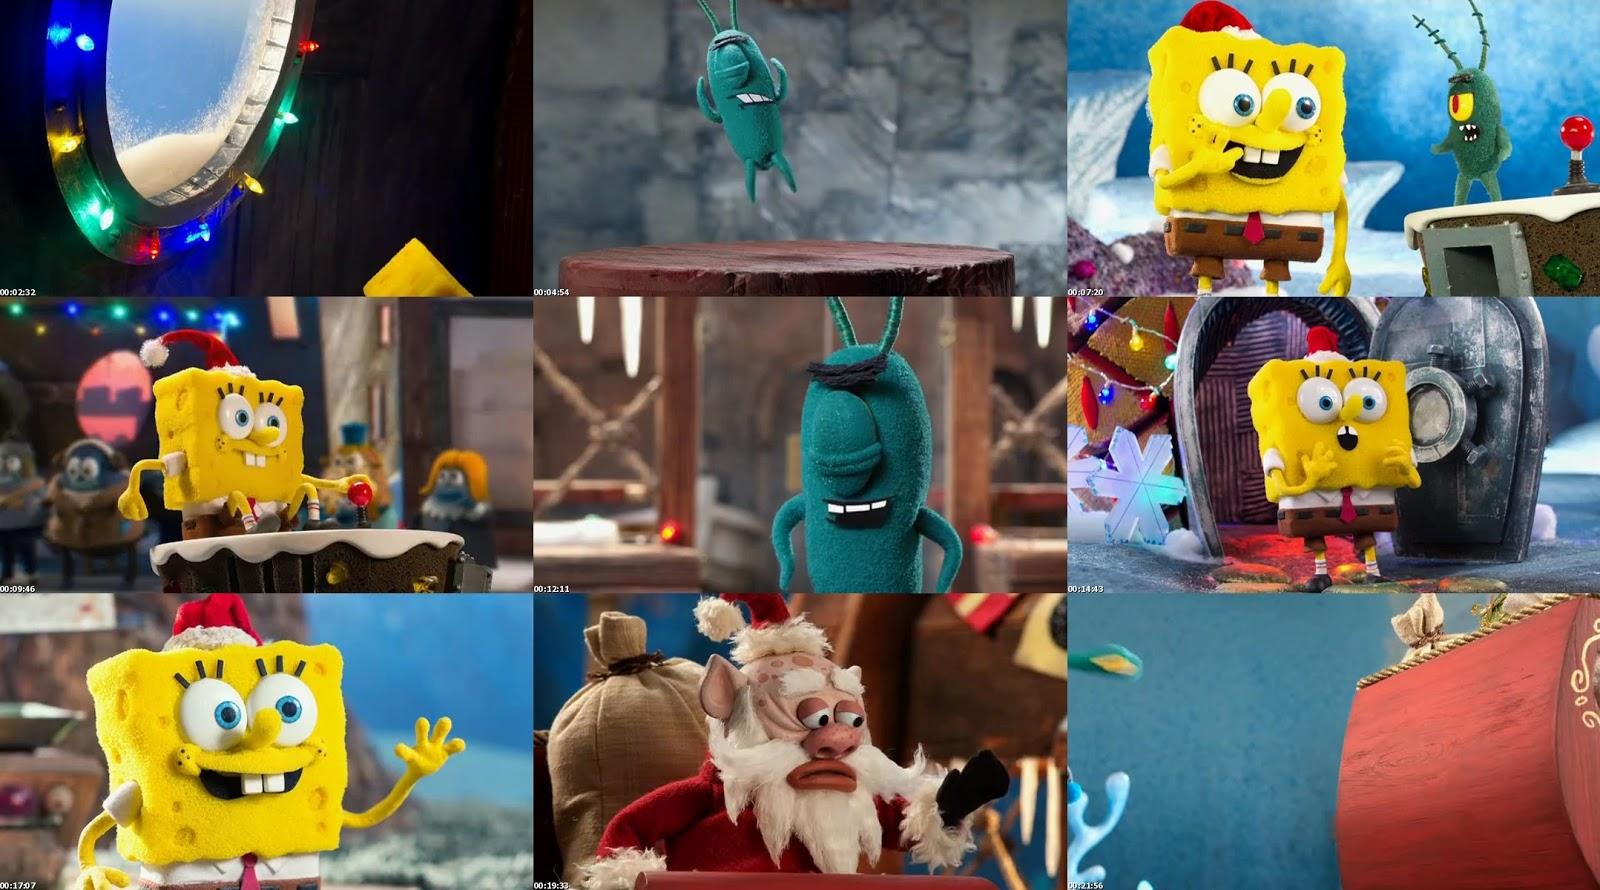 SpongeBob SquarePants - Watch Full Episodes and Clips - TV.com